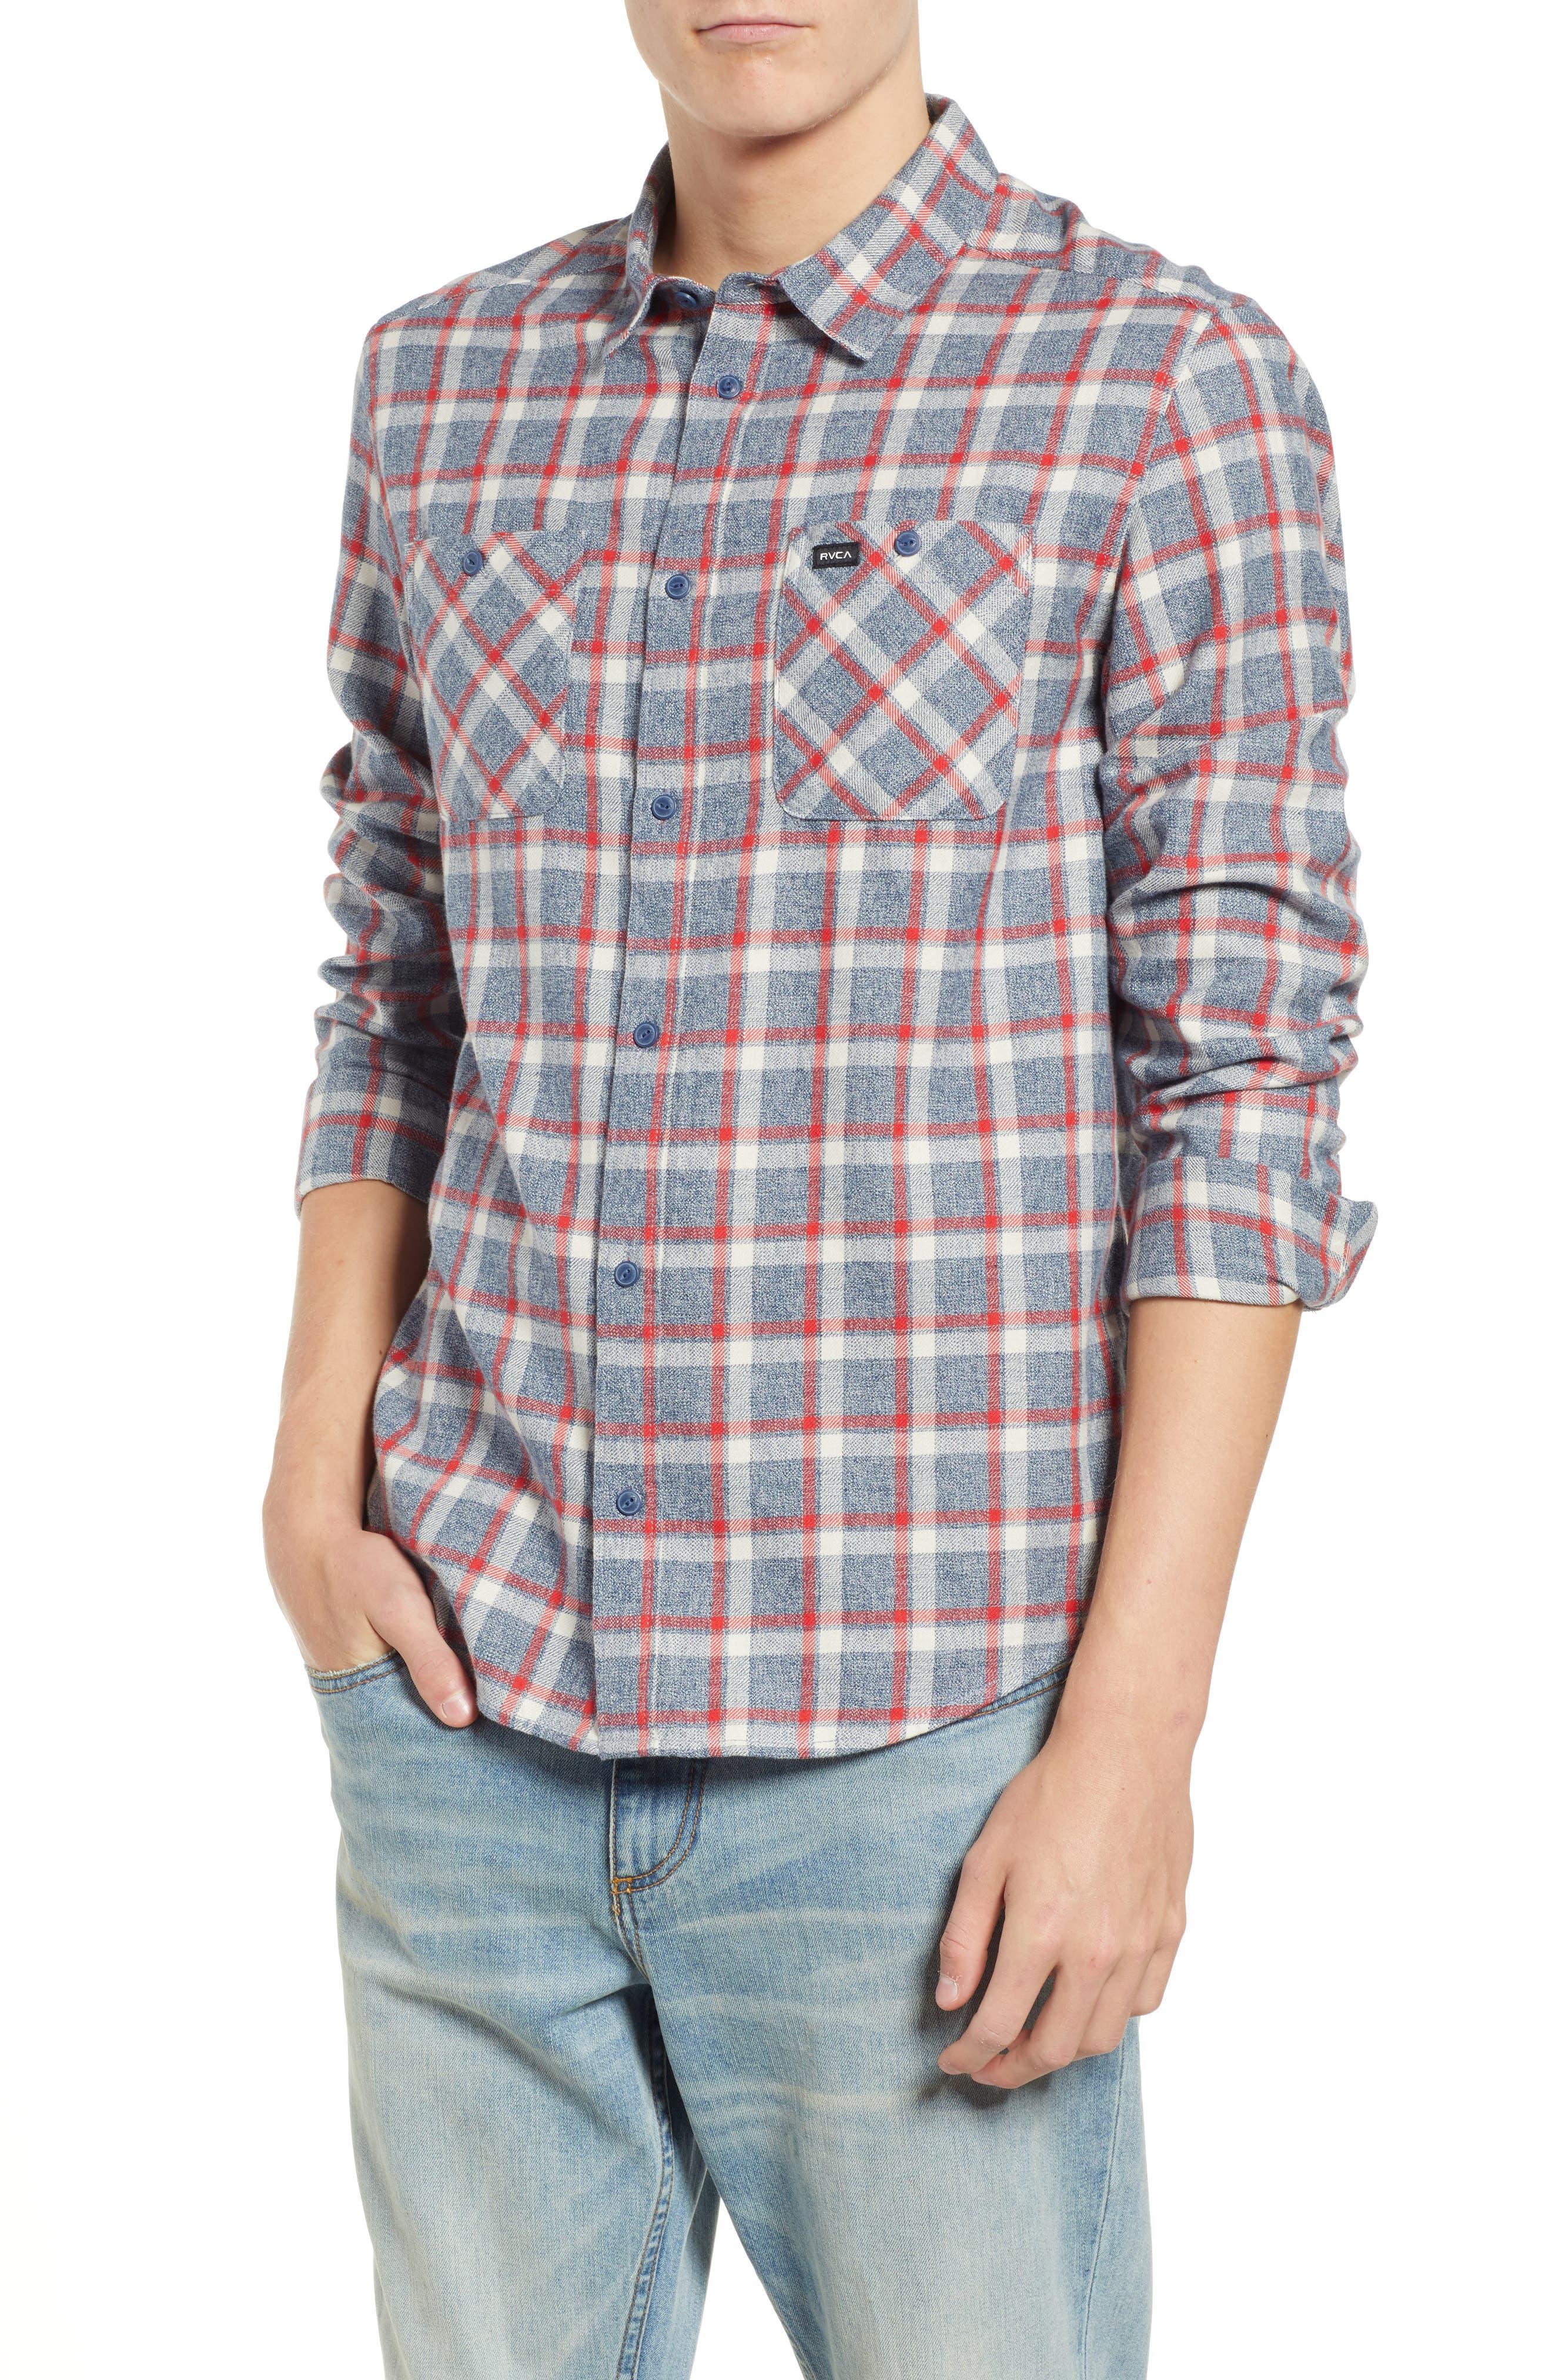 Rvca Good Stuff Check Flannel Shirt, Blue